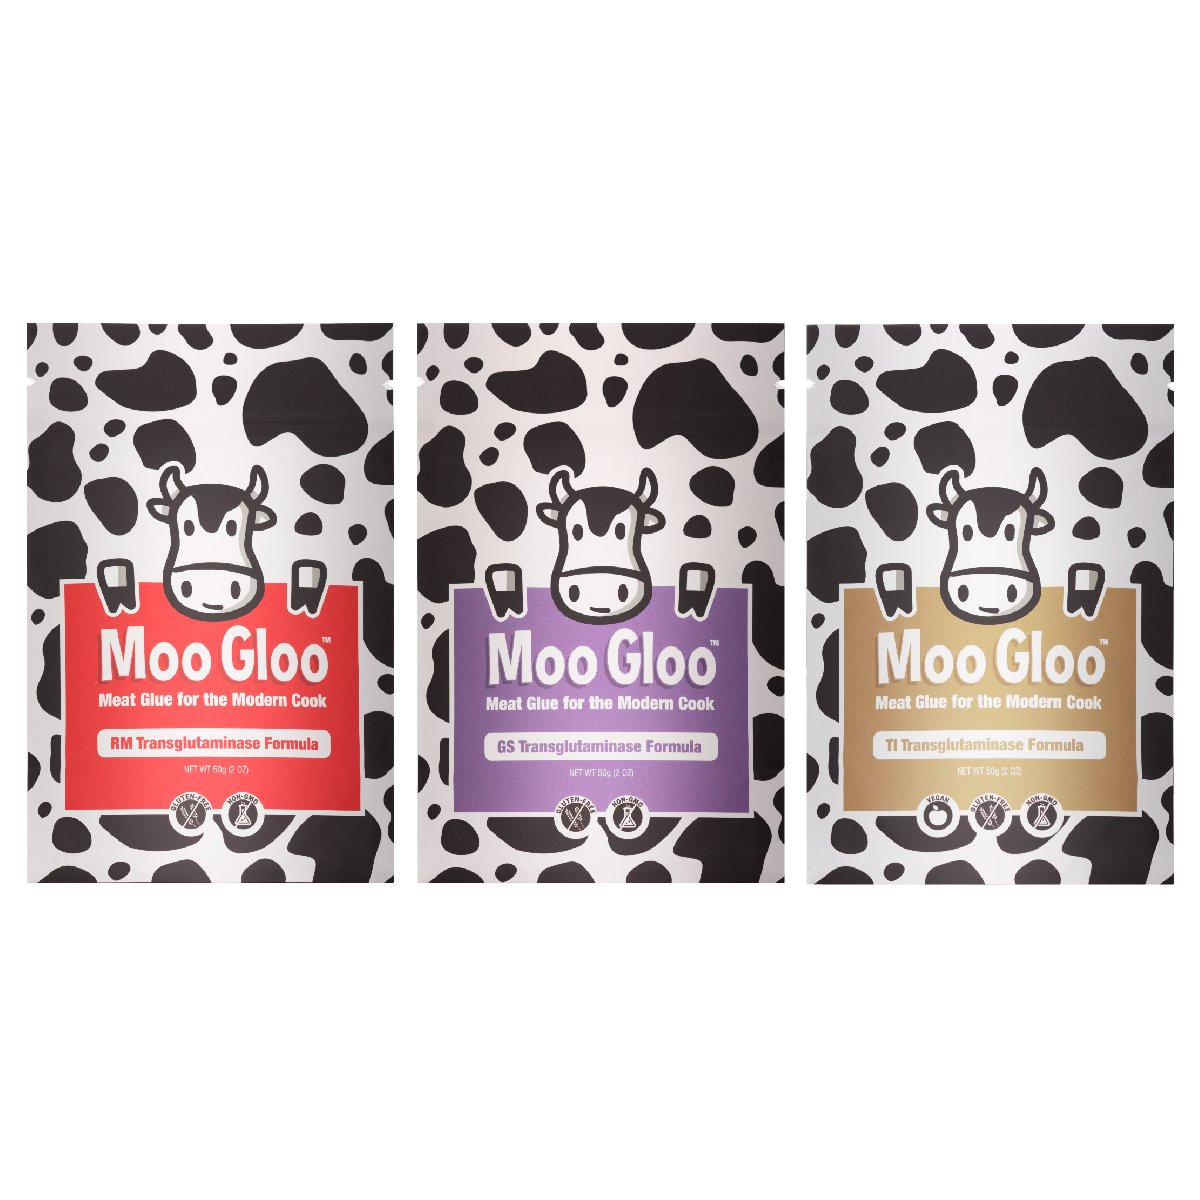 Moo Gloo Value Pack - Transglutaminase - Meat Glue - 150g/6oz. (Bundle with 3 items) by Moo Gloo (Image #1)